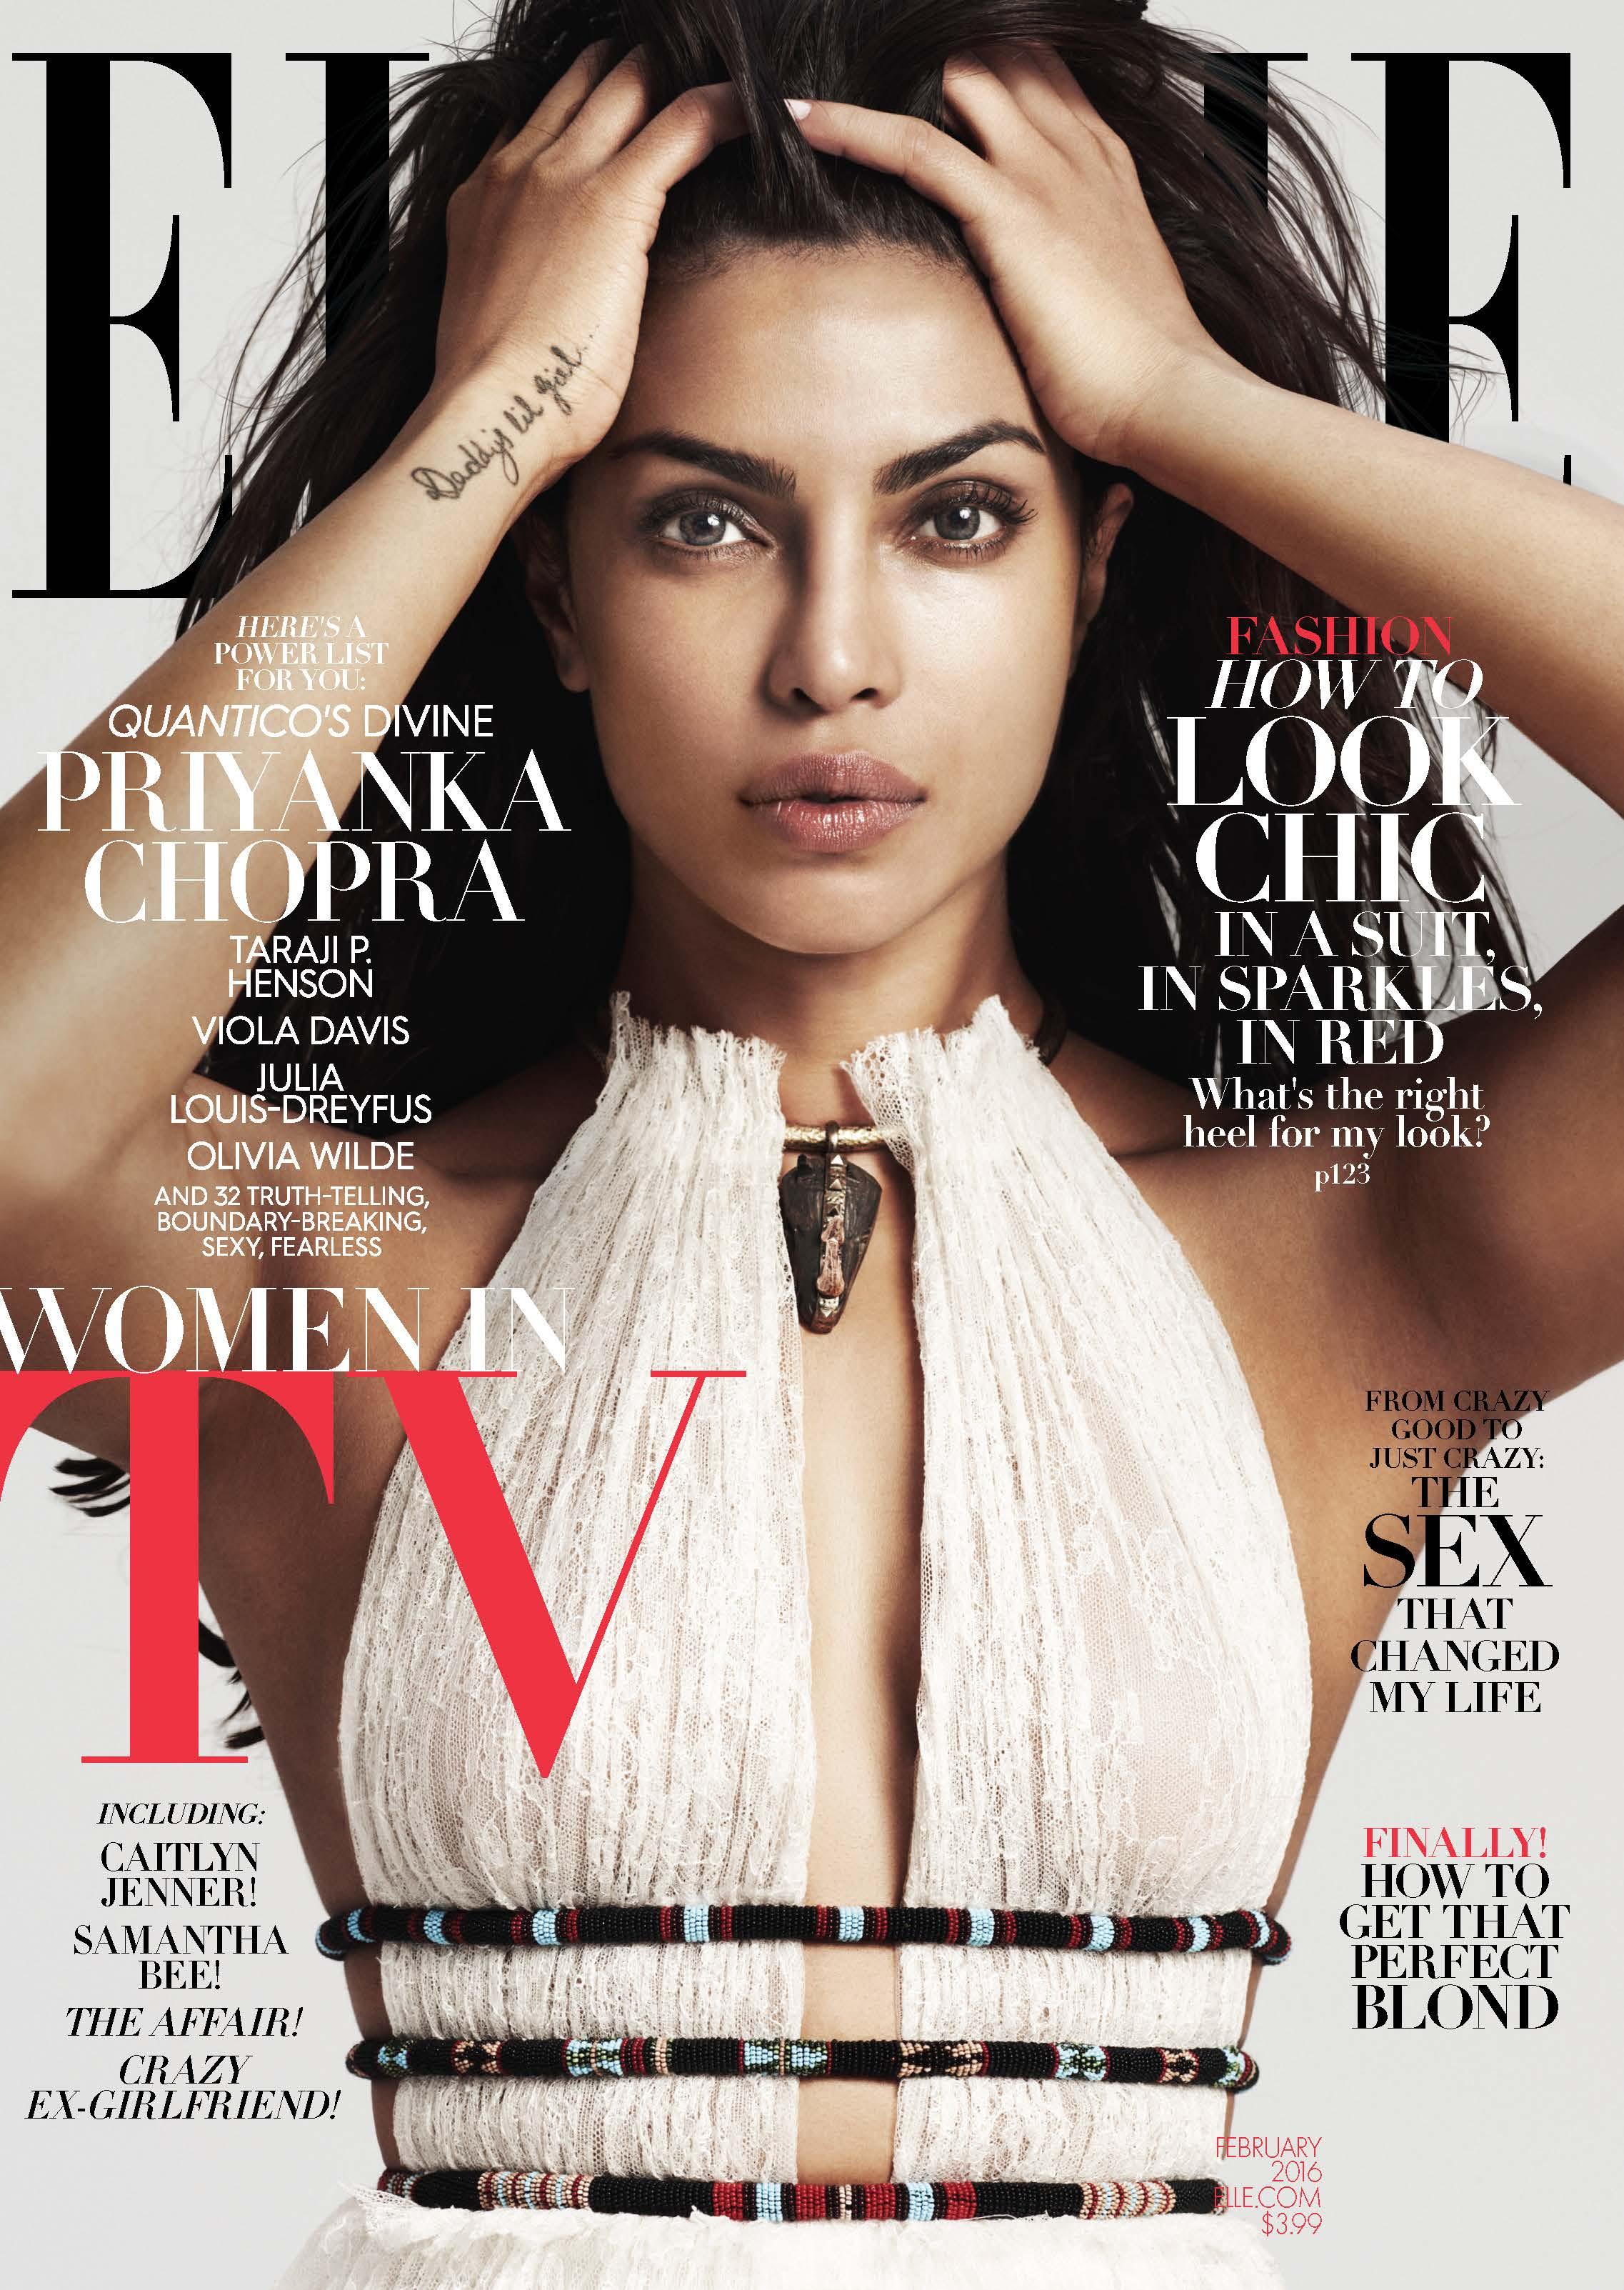 priyanka chopra elle magazine cover february 2016